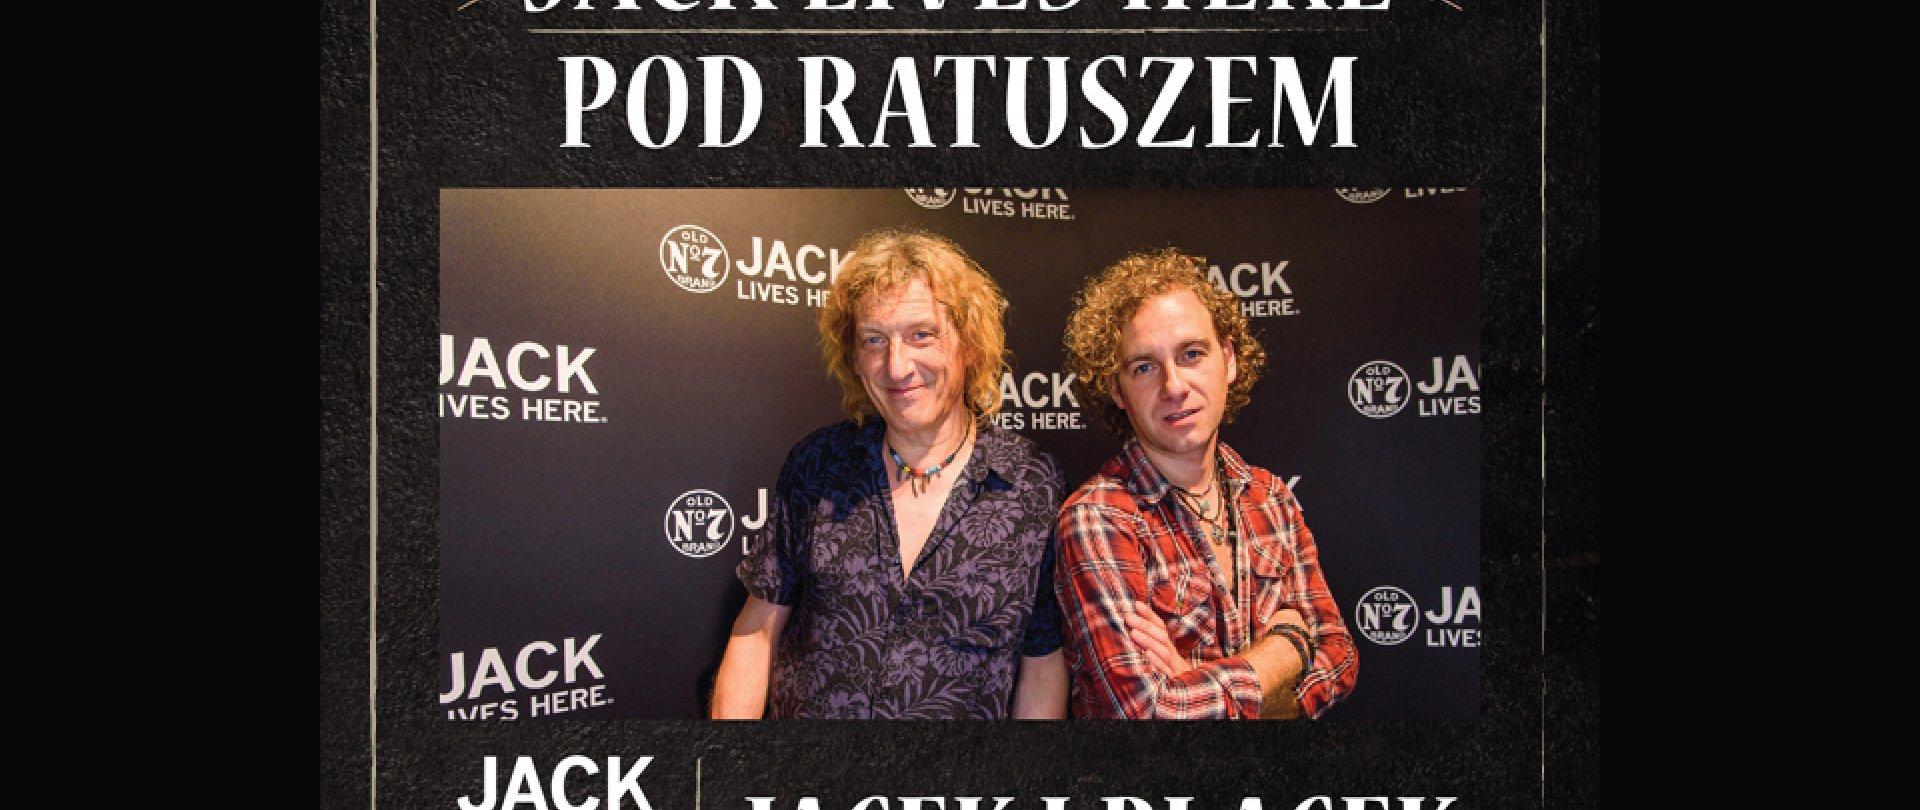 Jacek i Placek - JLH pod Ratuszem